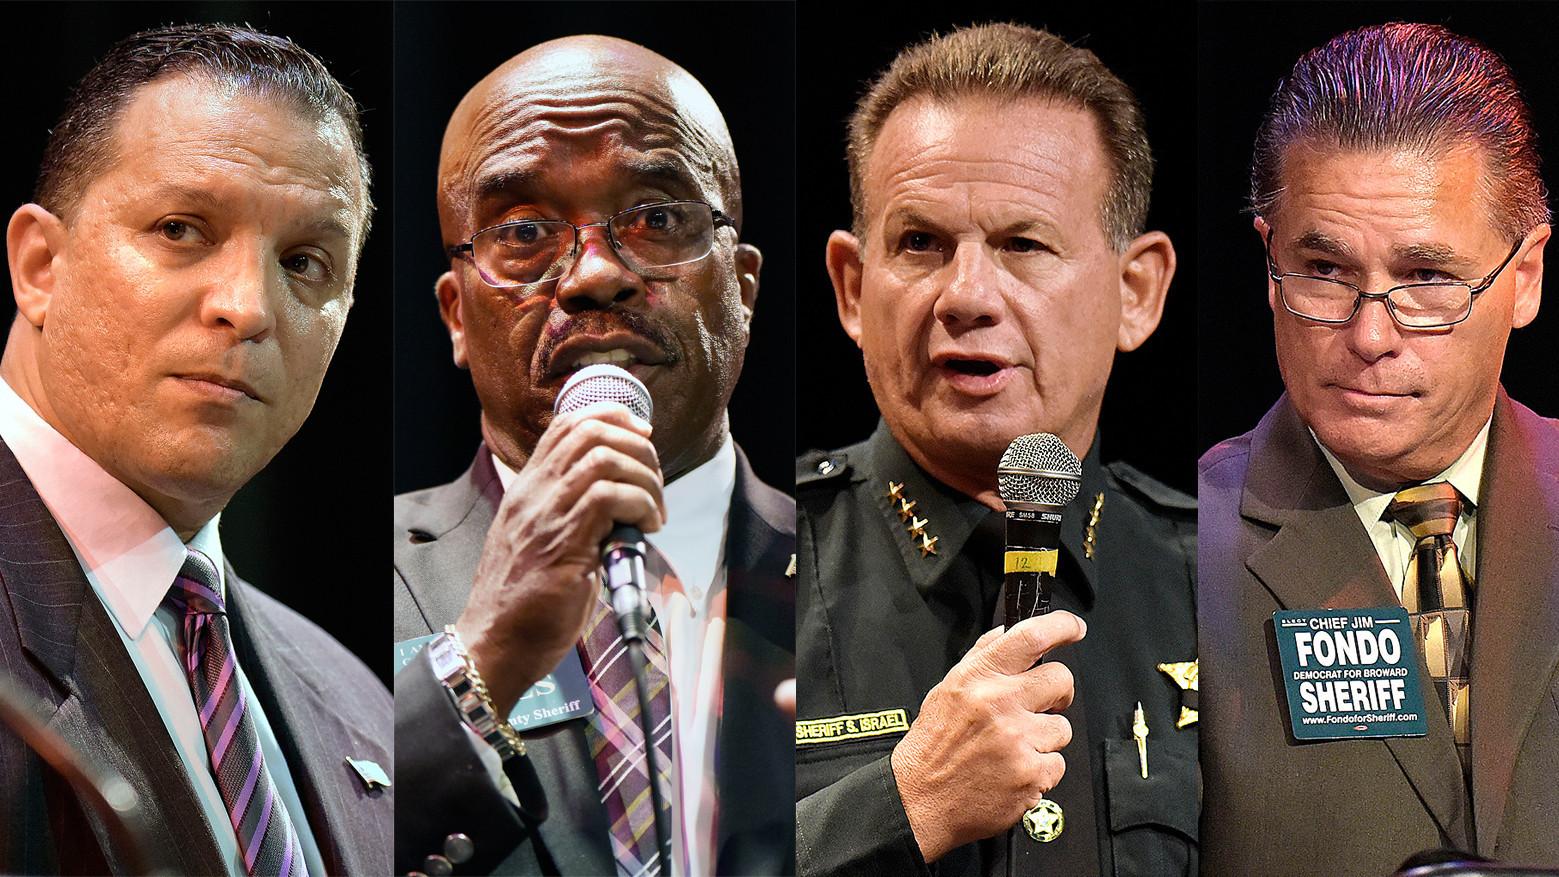 Broward sheriff candidates: No race problems here - Sun ...